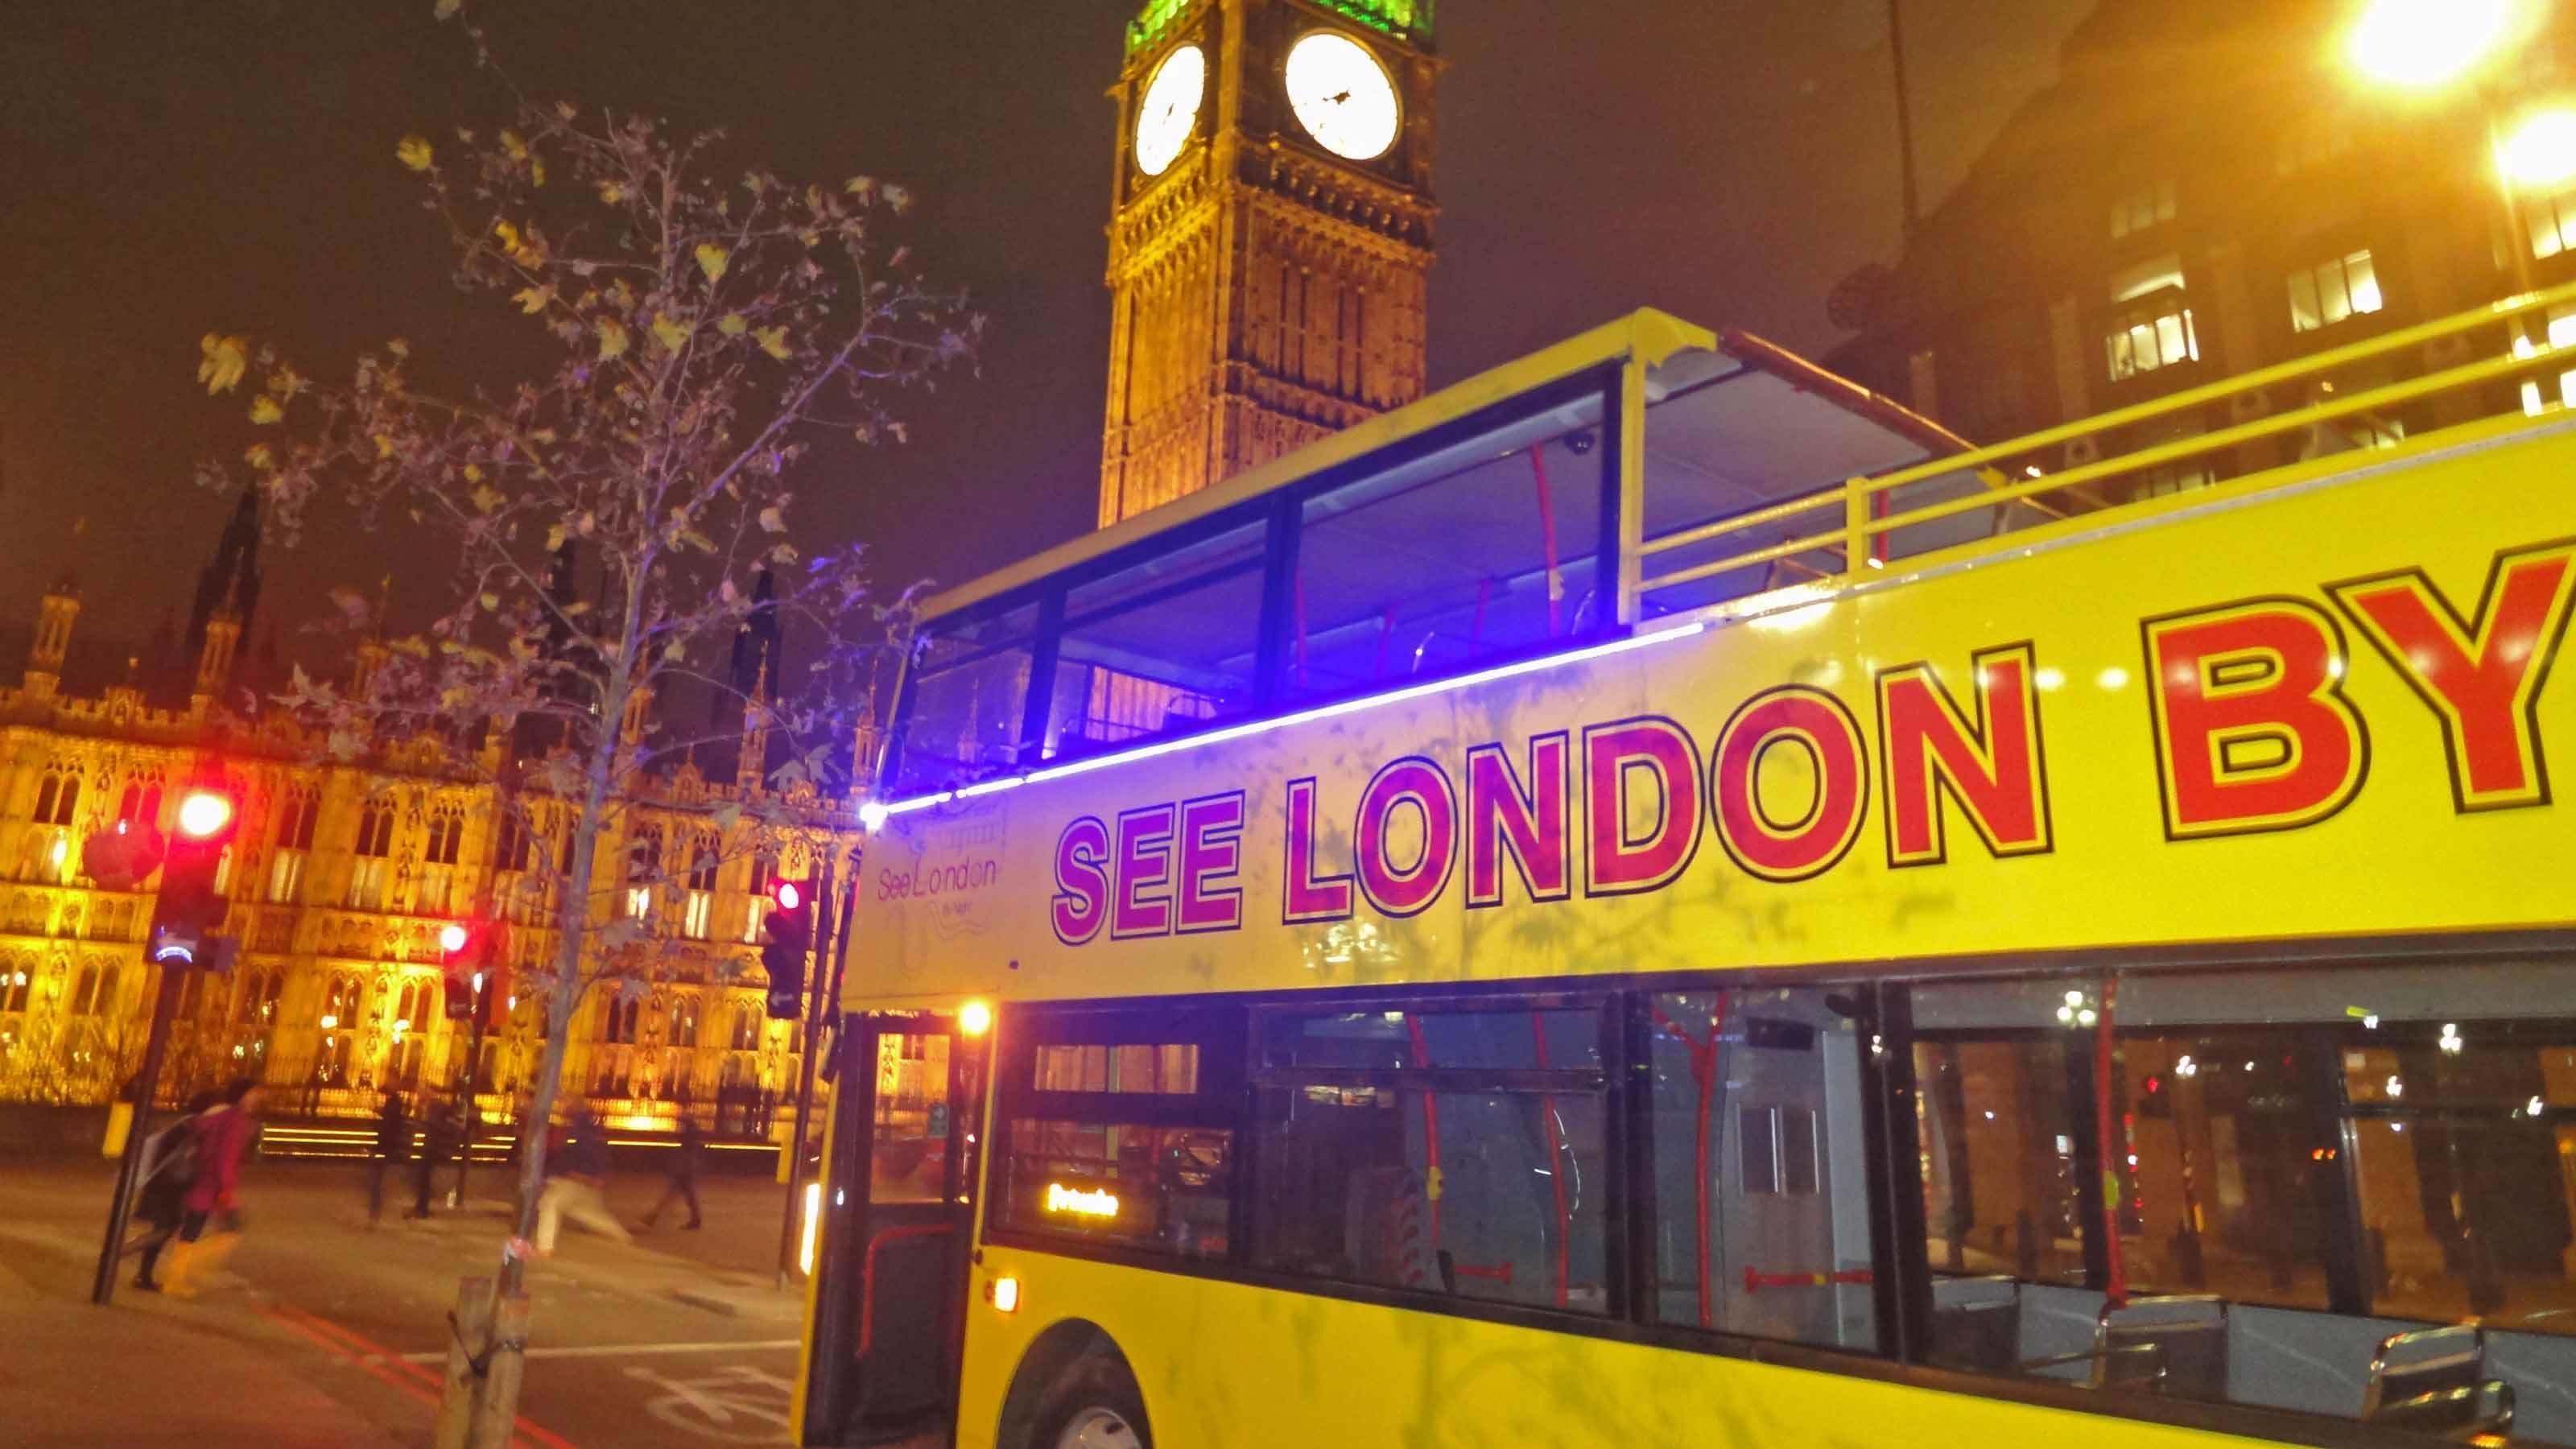 Tour bus near big ben in London